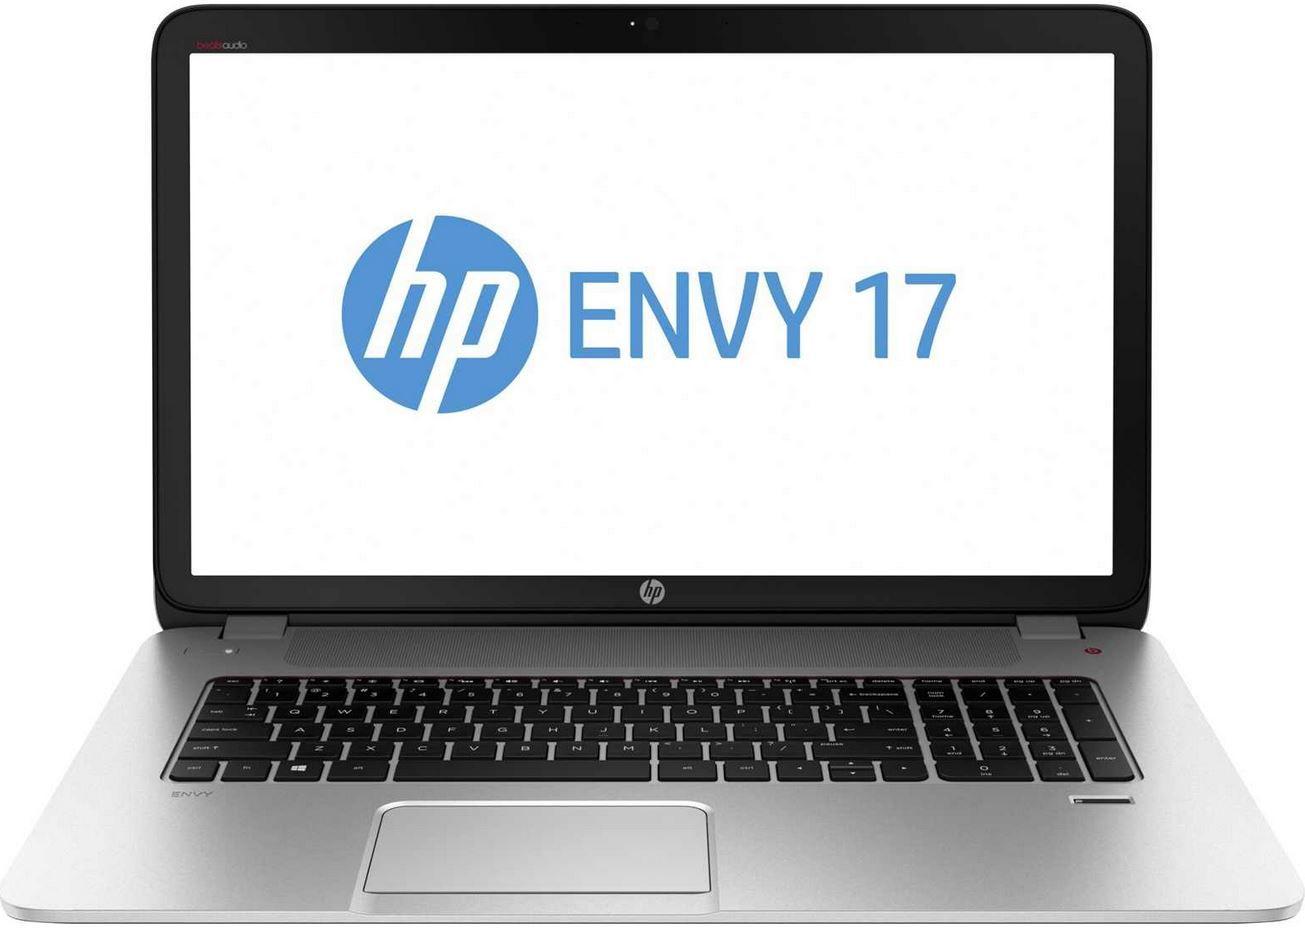 HP ENVY 17 j133eg Notebook   17,3 Notebook mit i7 4702, 16GB RAM, 2 x 1 TB HDD für 949€